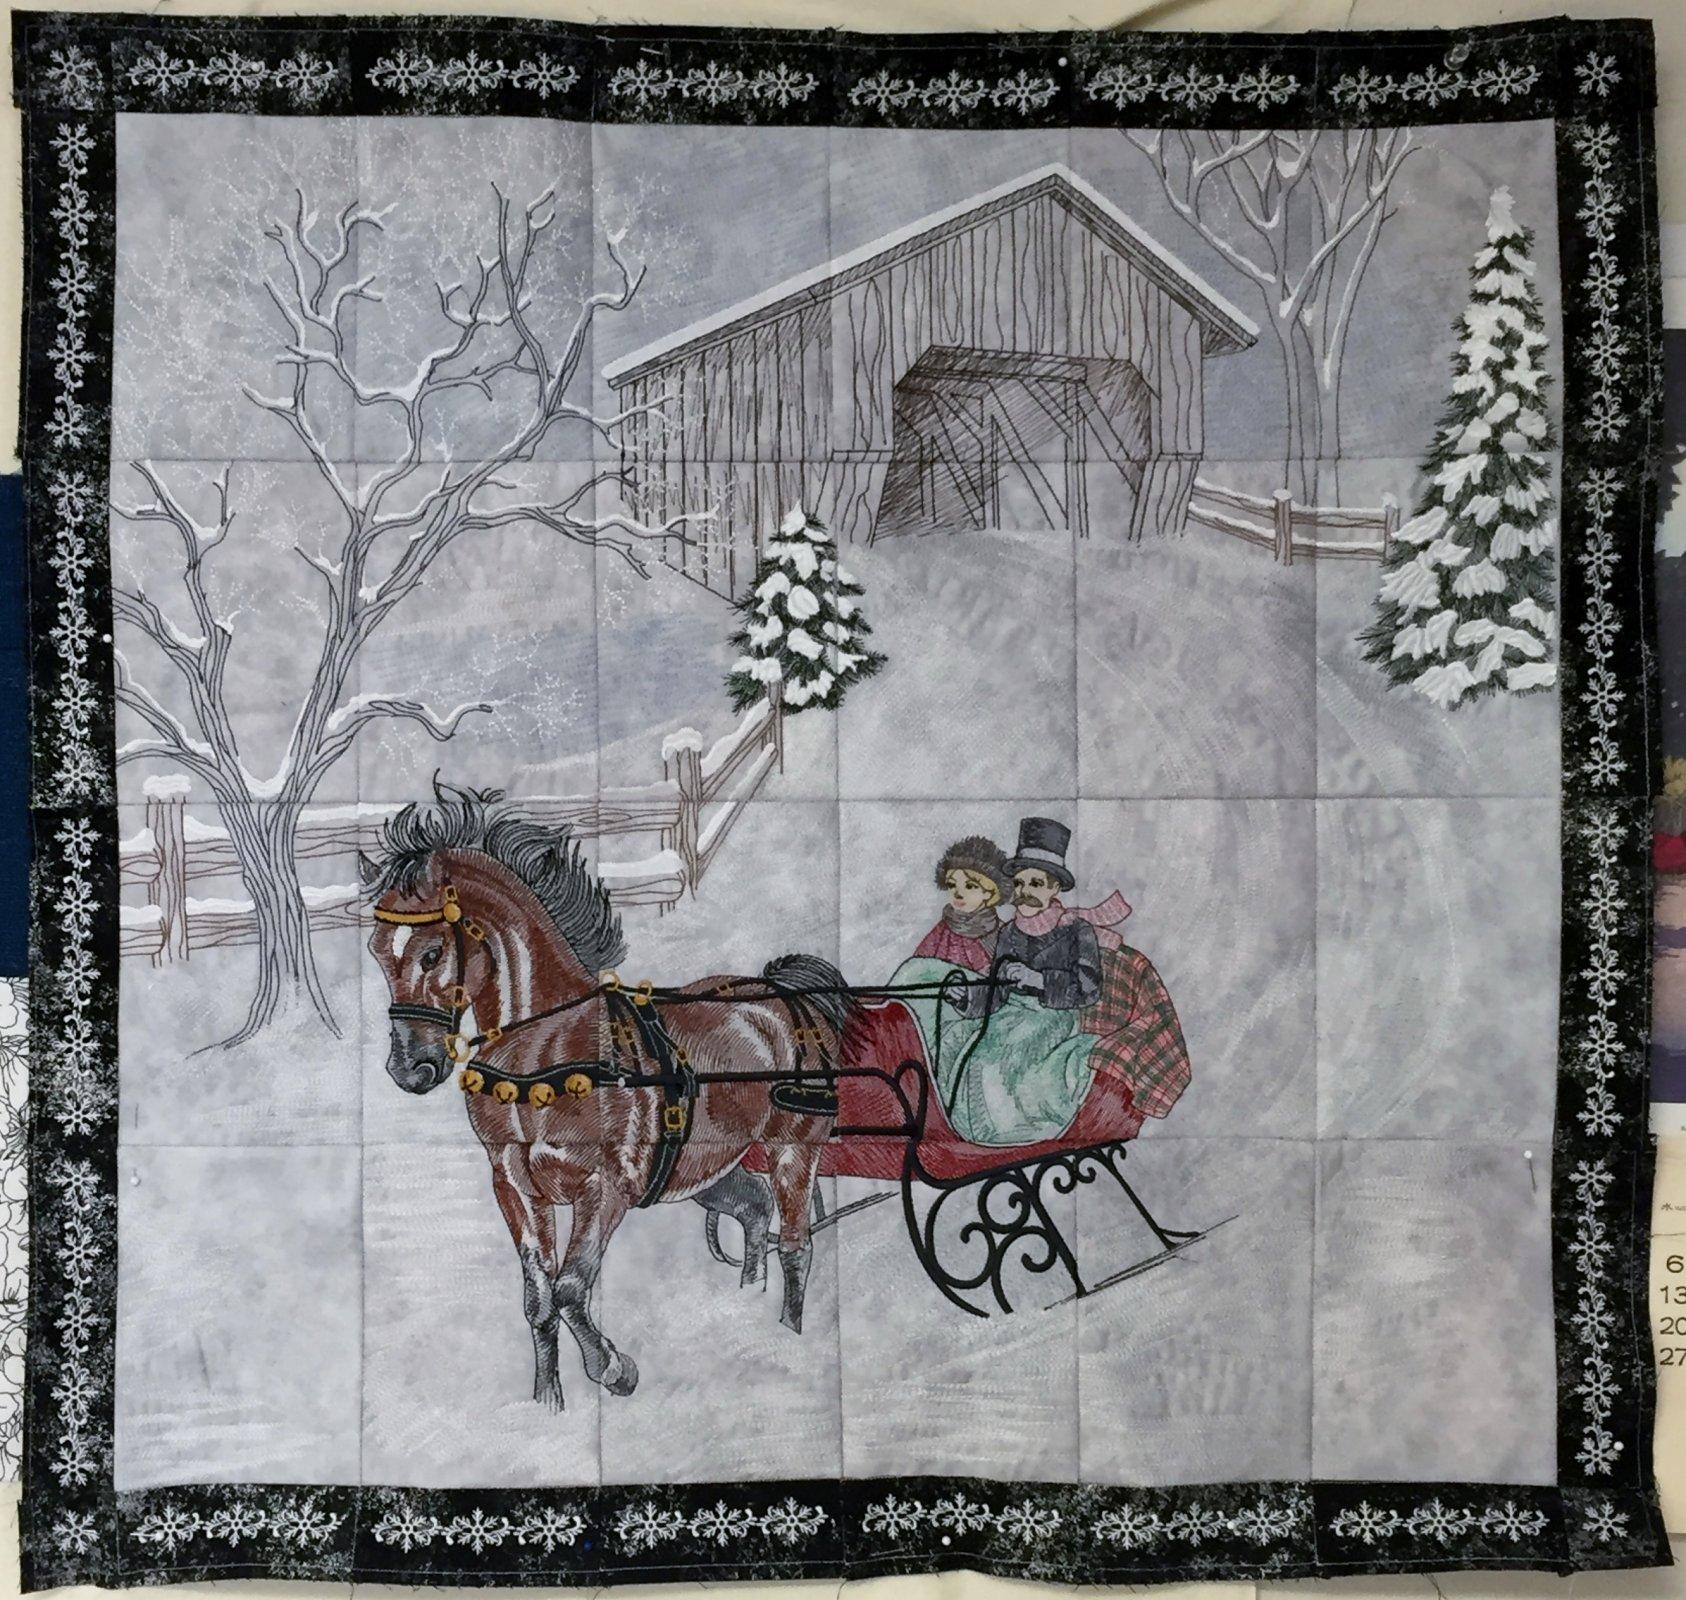 Dashing Thru The Snow Tiling Embroidery